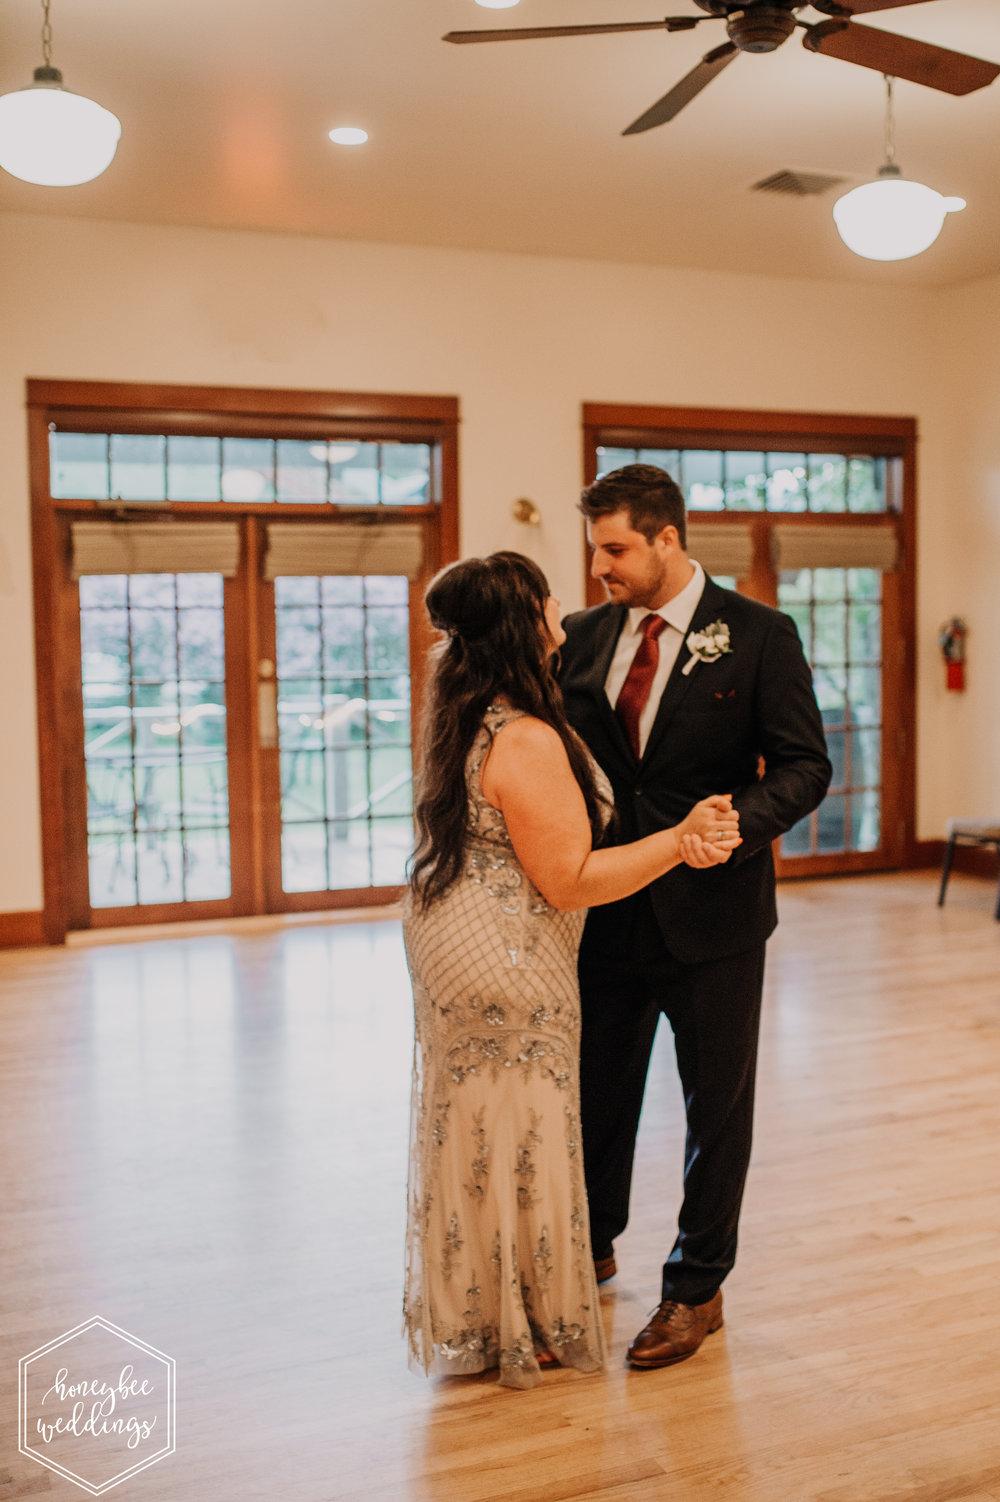 216 Chico Hotsprings Wedding_Bowdino 2018-3883.jpg